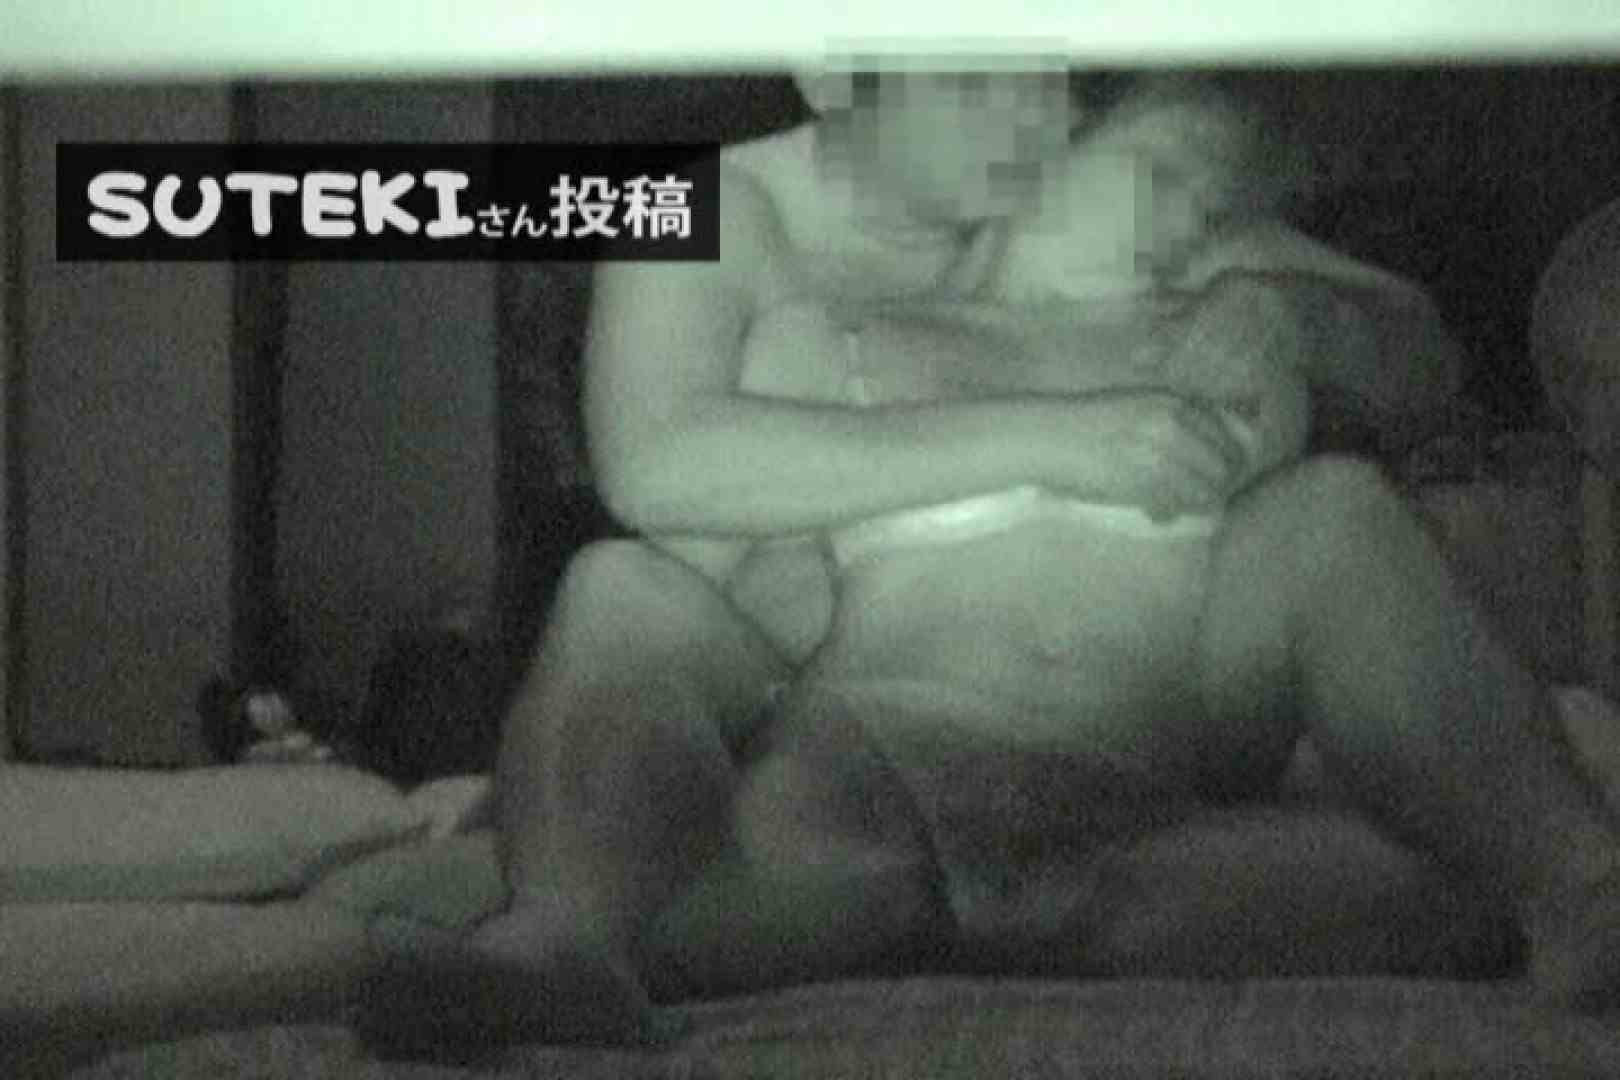 SUTEKIさん投稿 ナイトショット 盗撮 | 一般投稿  105画像 8